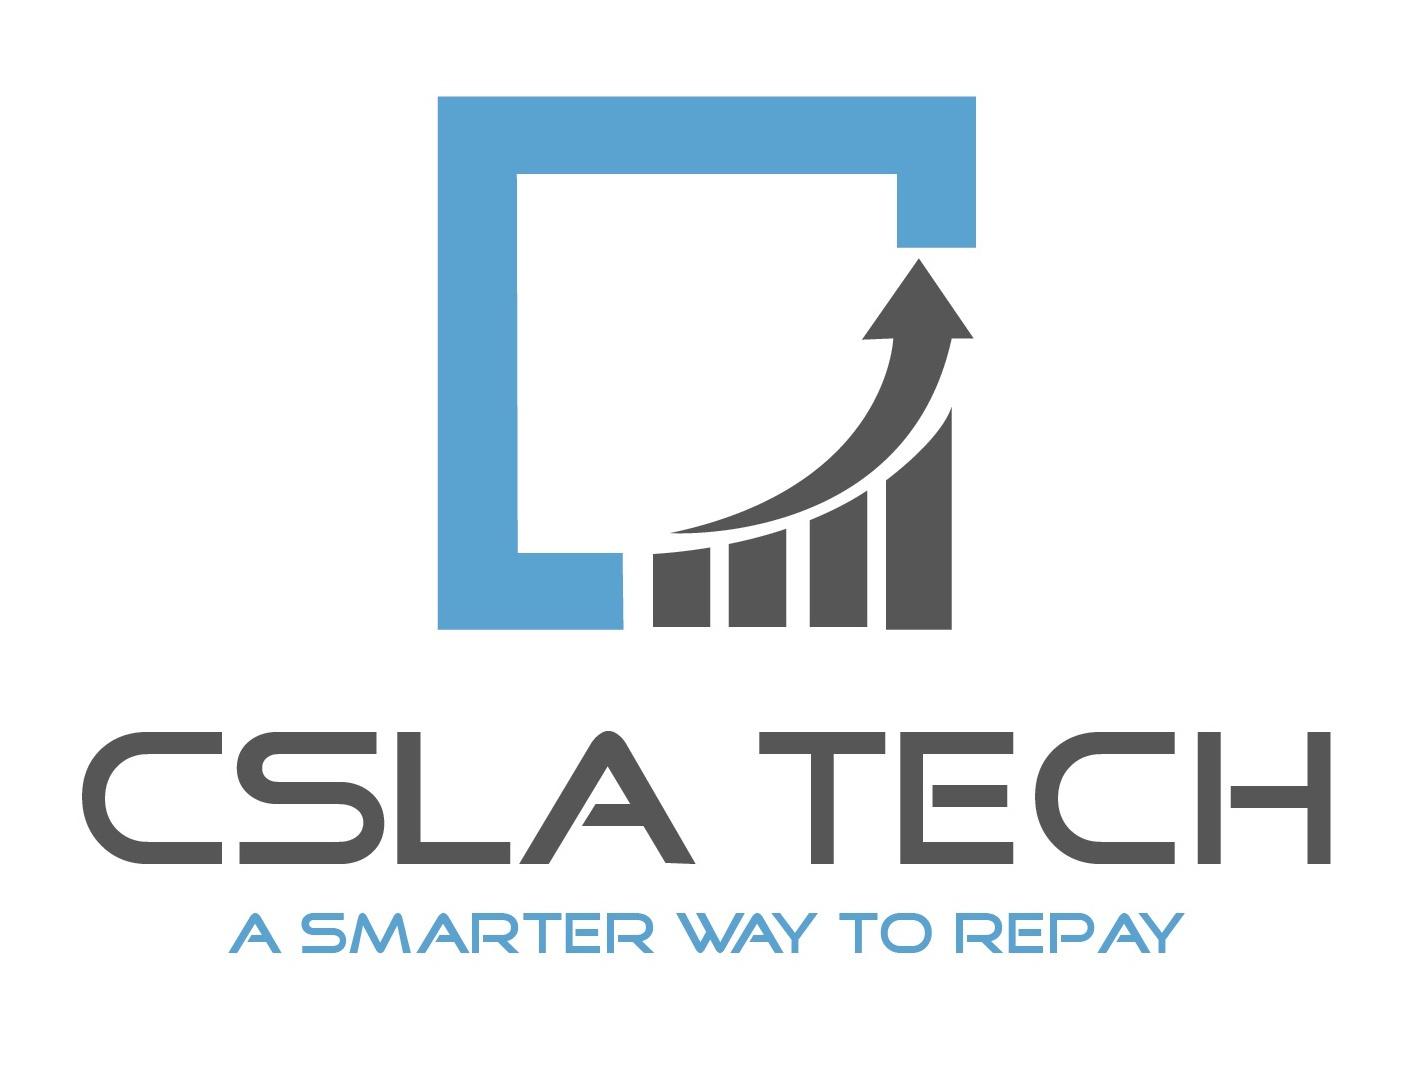 CSLA_Tech_LLC_logo.jpg